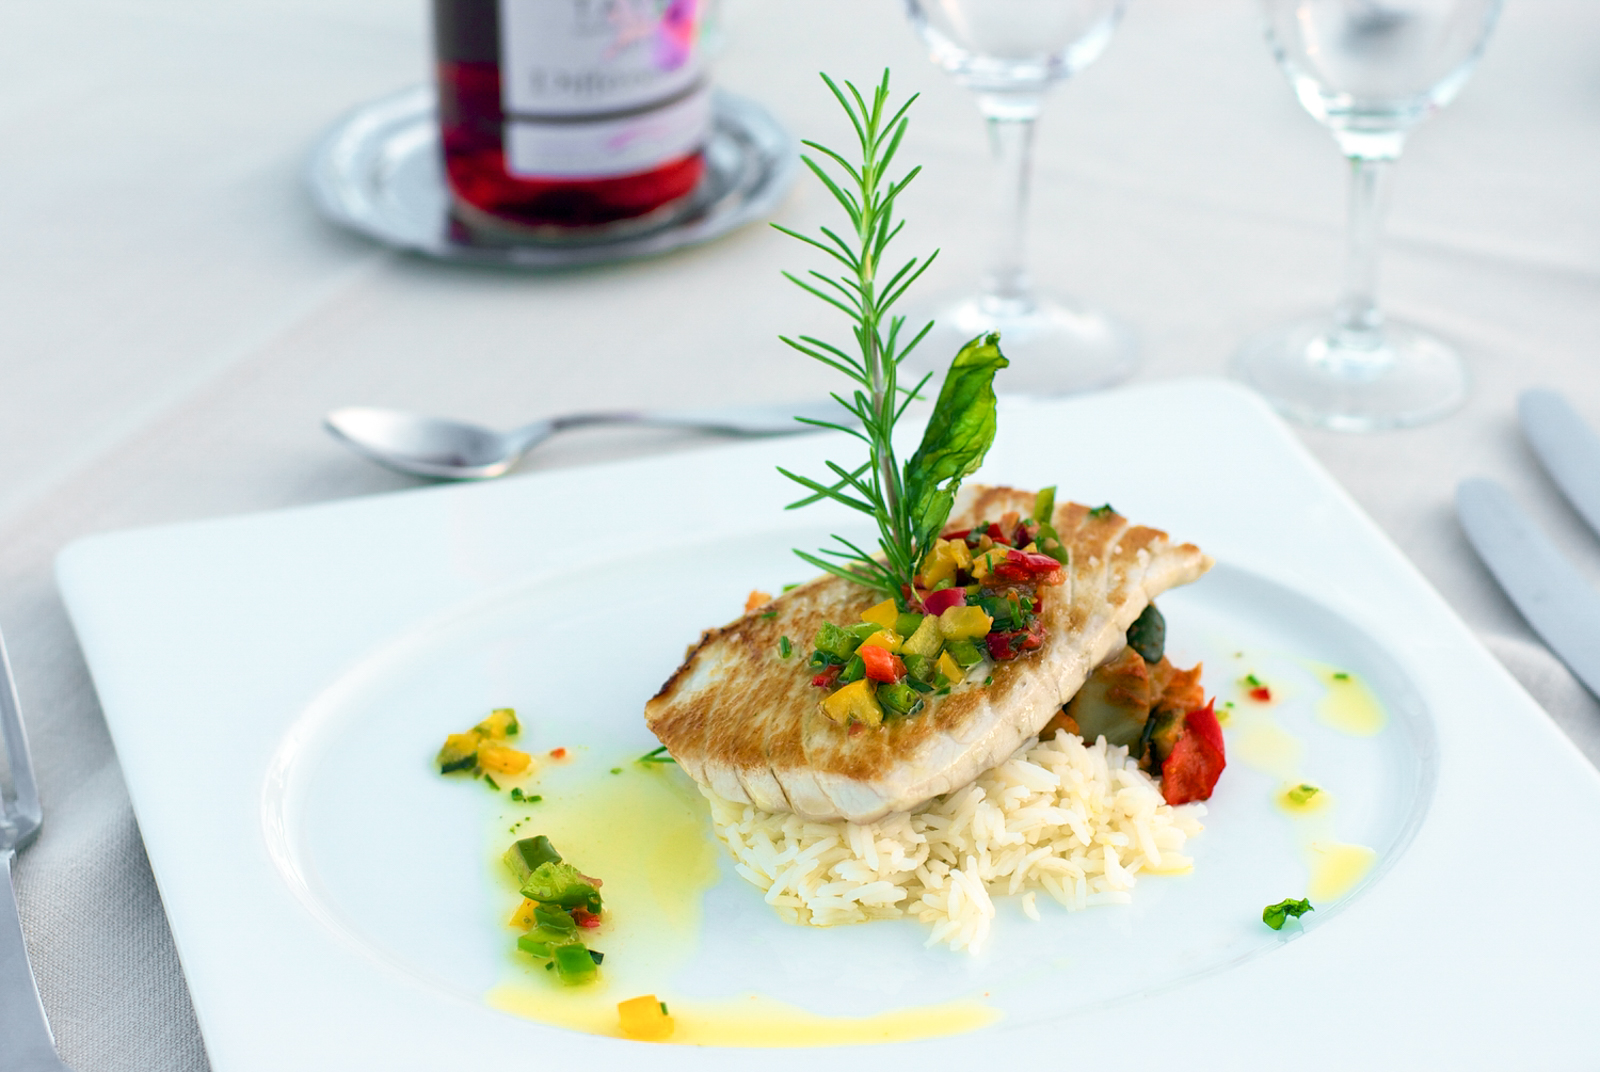 012_Hotel_Restaurant_Cevennes_Anduze_Cuisine_Mediterraneenne